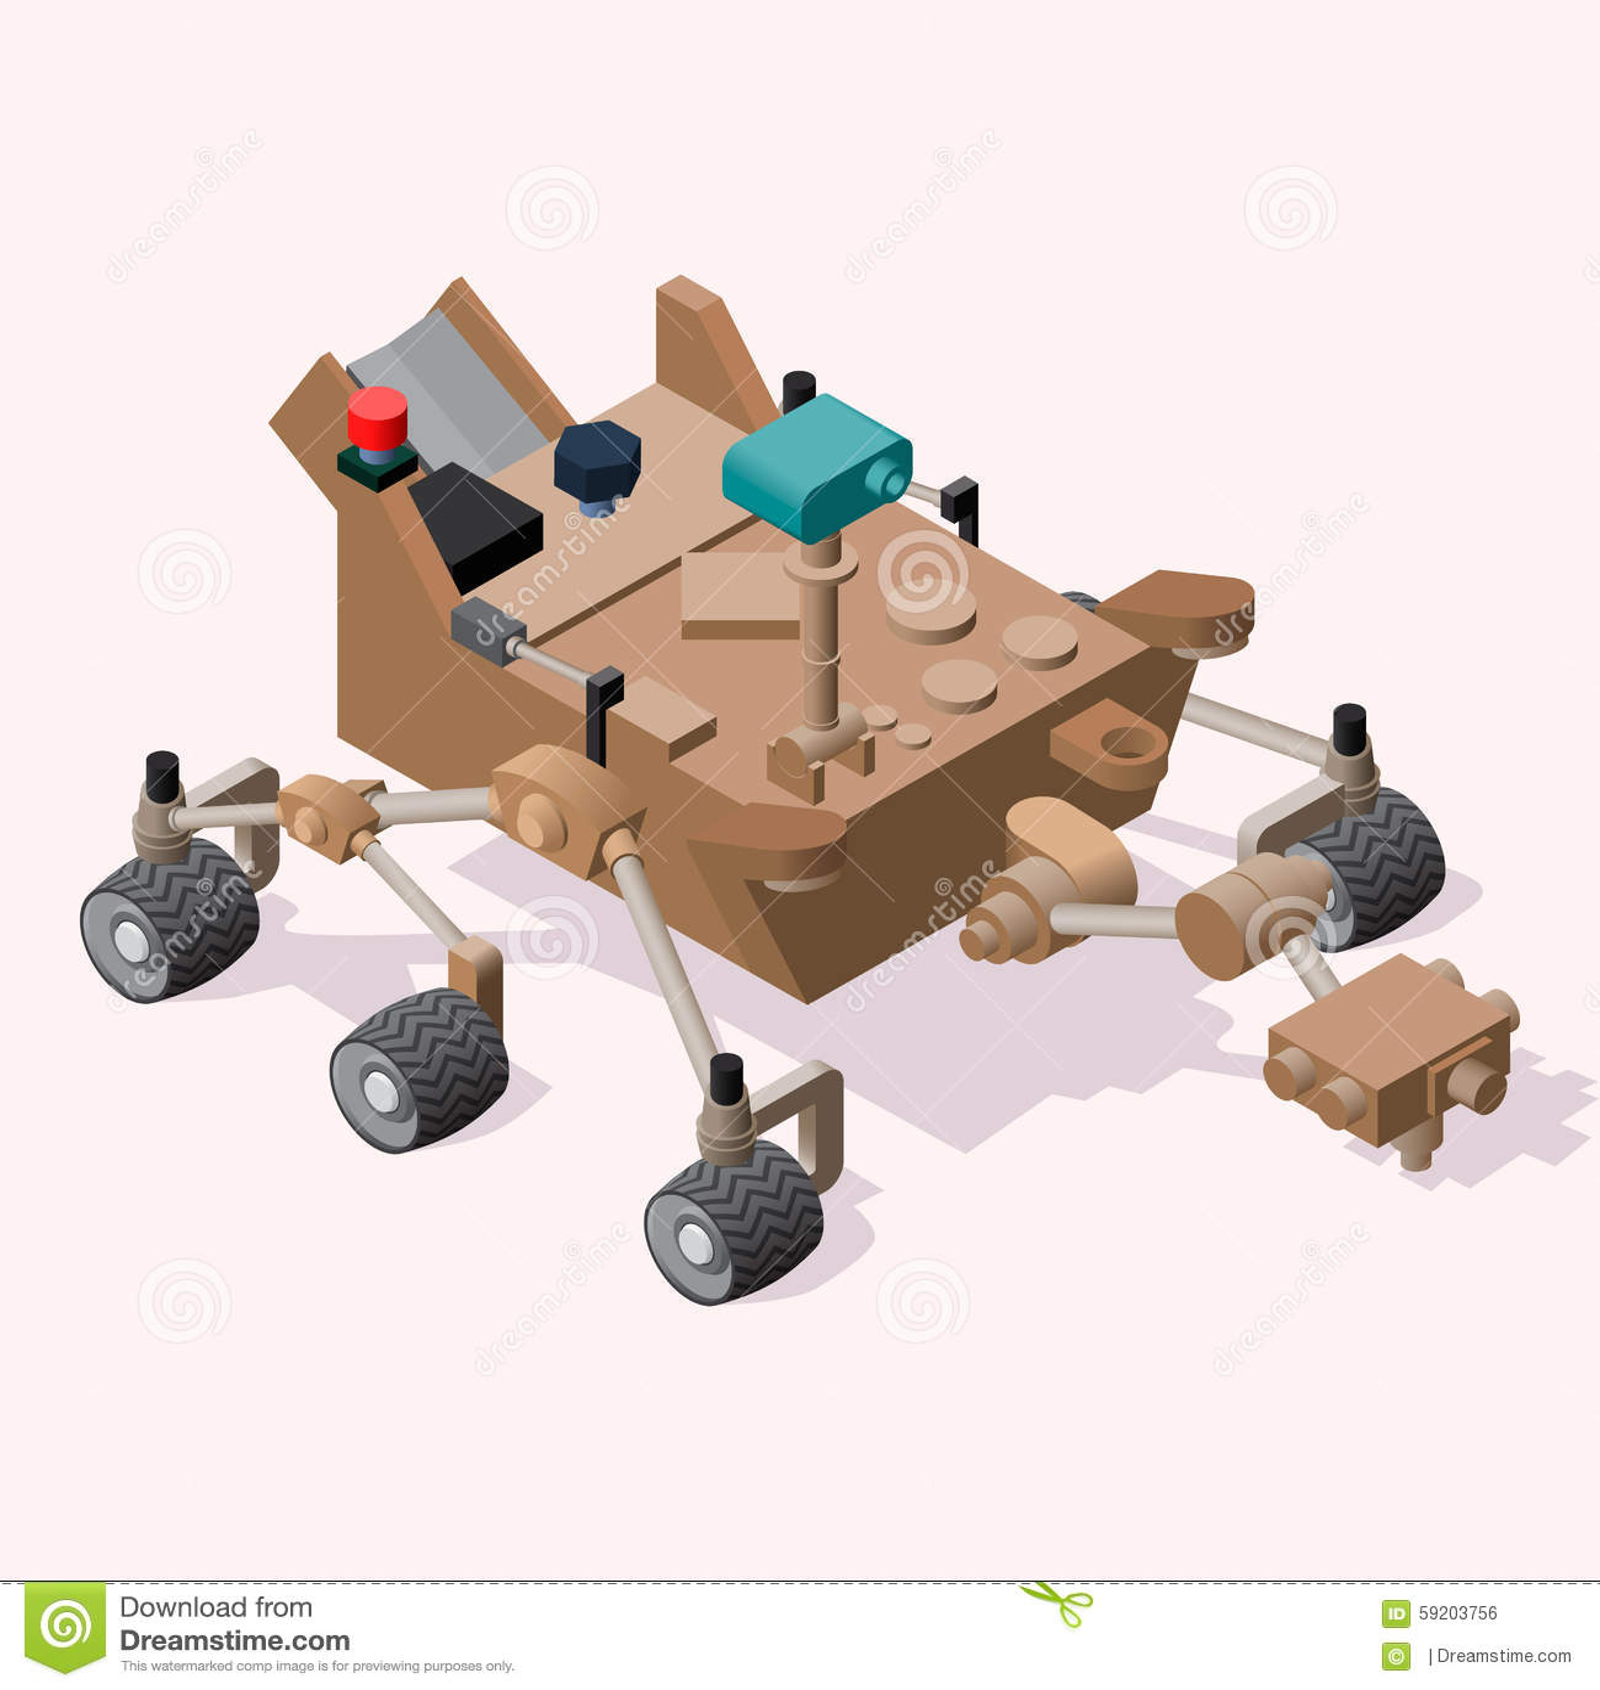 mars rover vector - photo #18